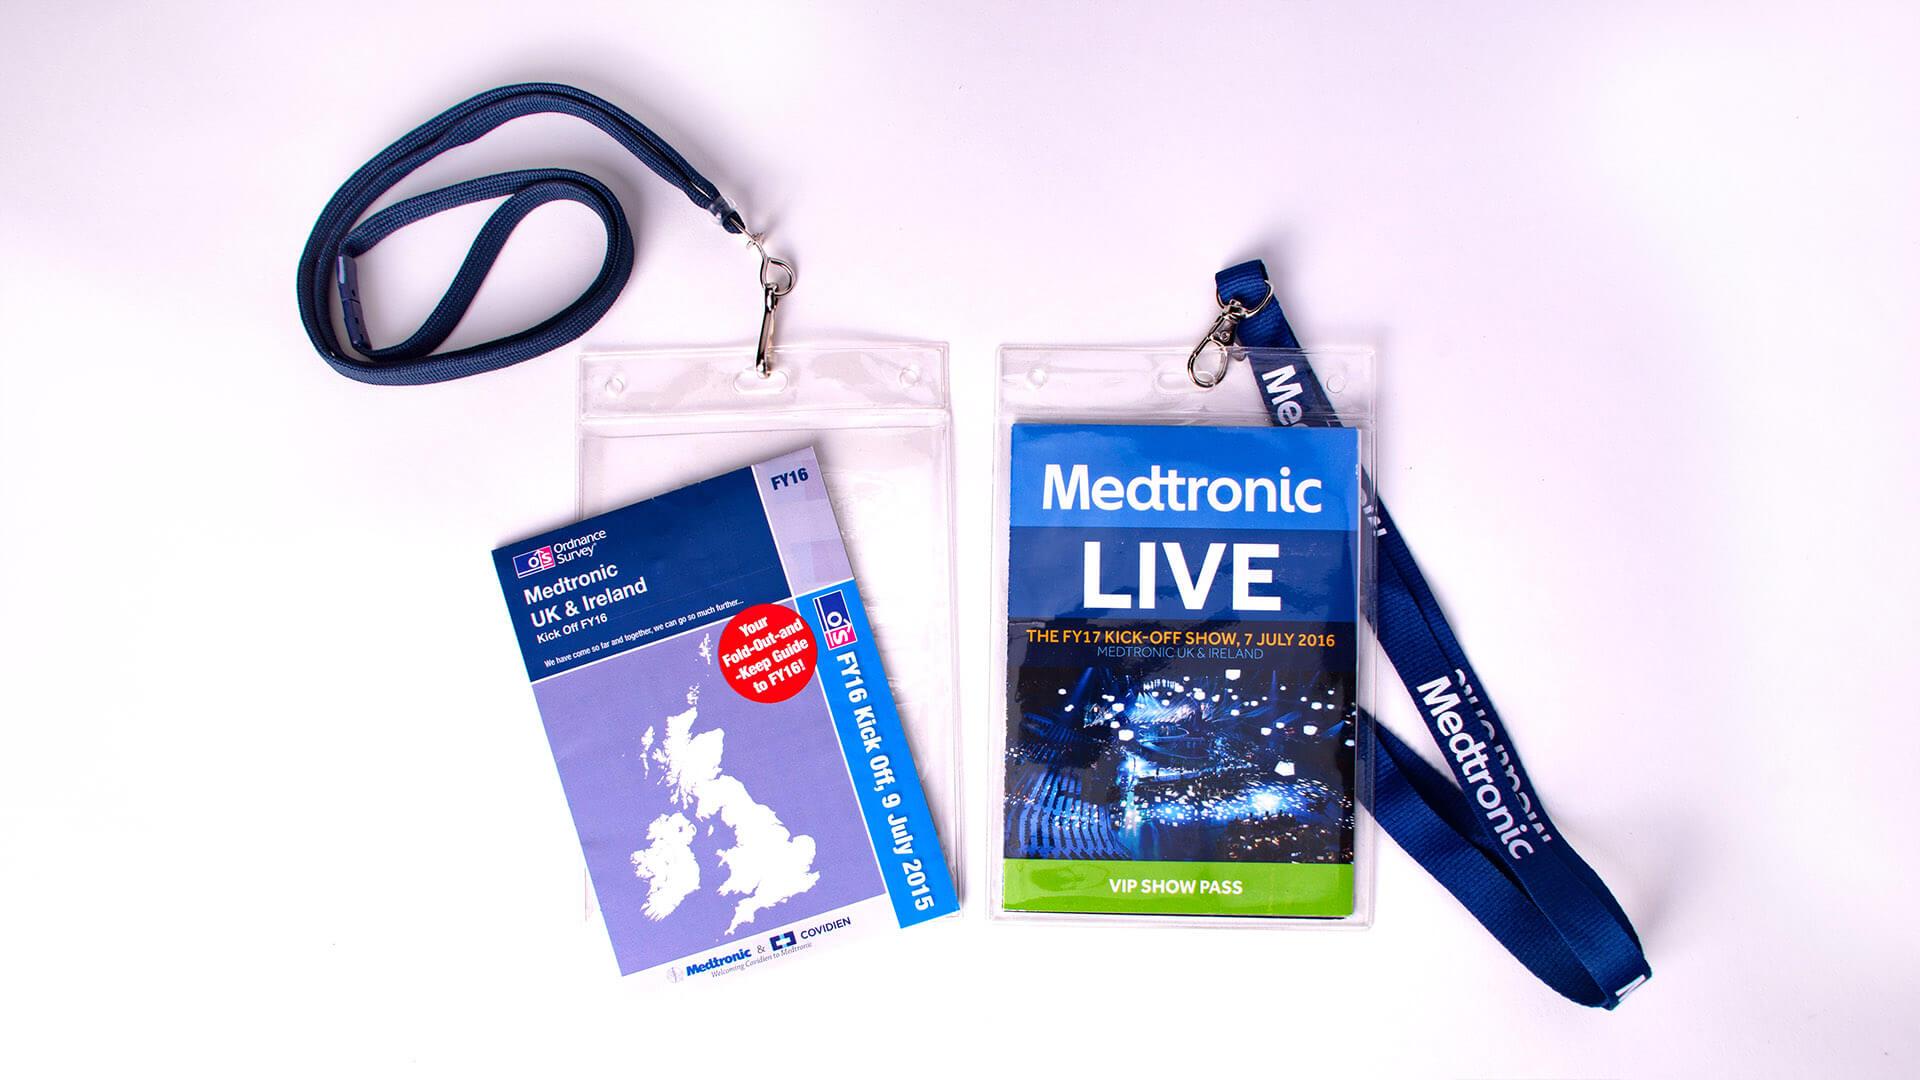 Medtronic FY event delegate passes